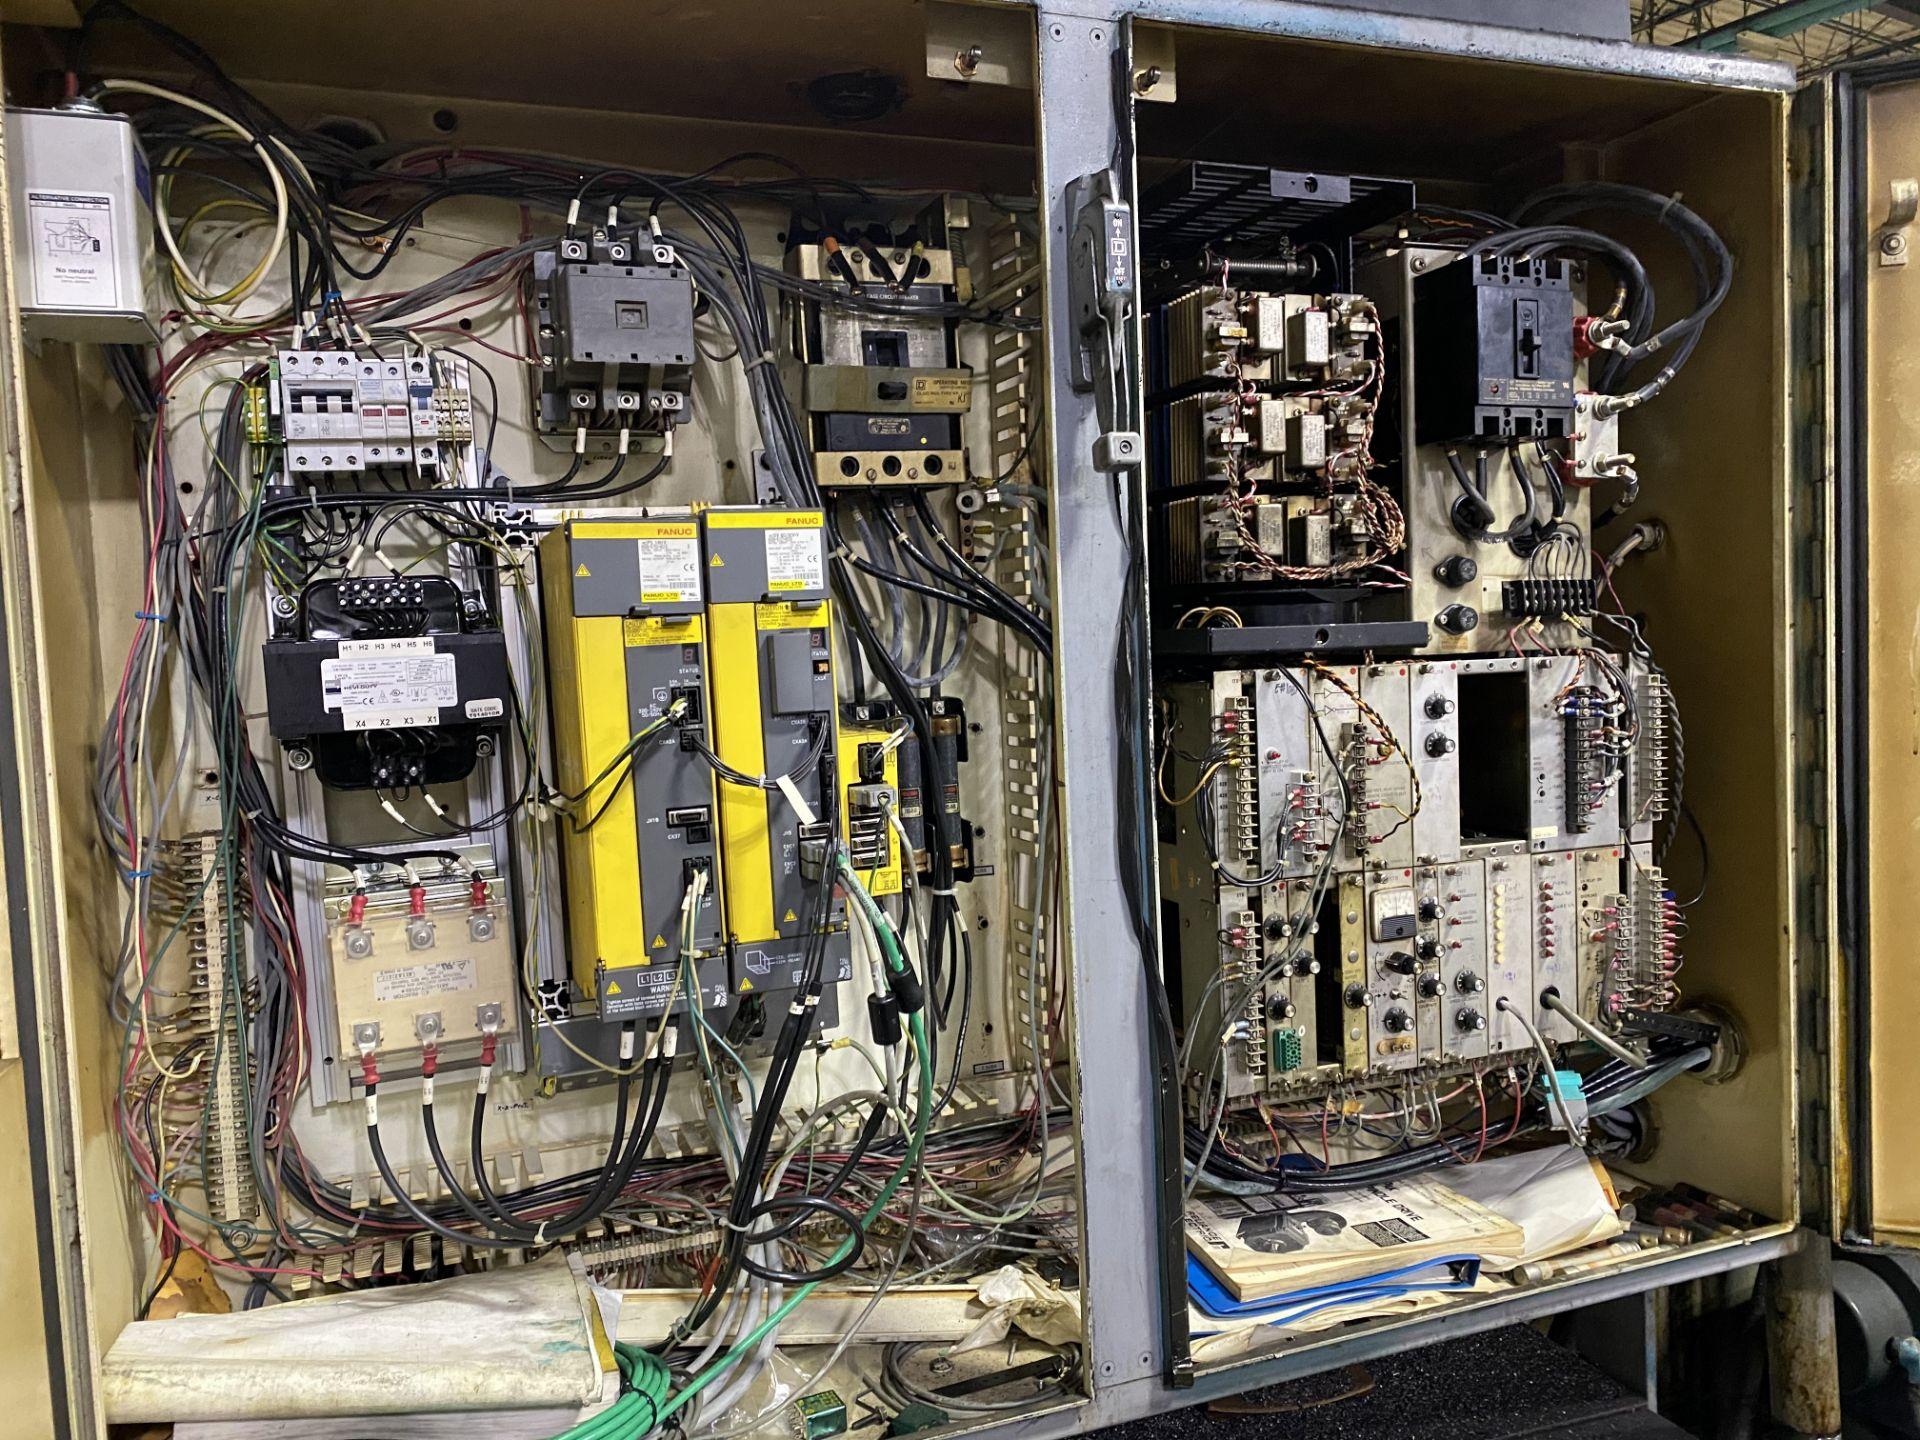 Cincinnati Cinturn 12 CNC Lathe w/ Fanuc Control RETROFIT ***PARTS MACHINE, NO CONTROLLER** - Image 5 of 8